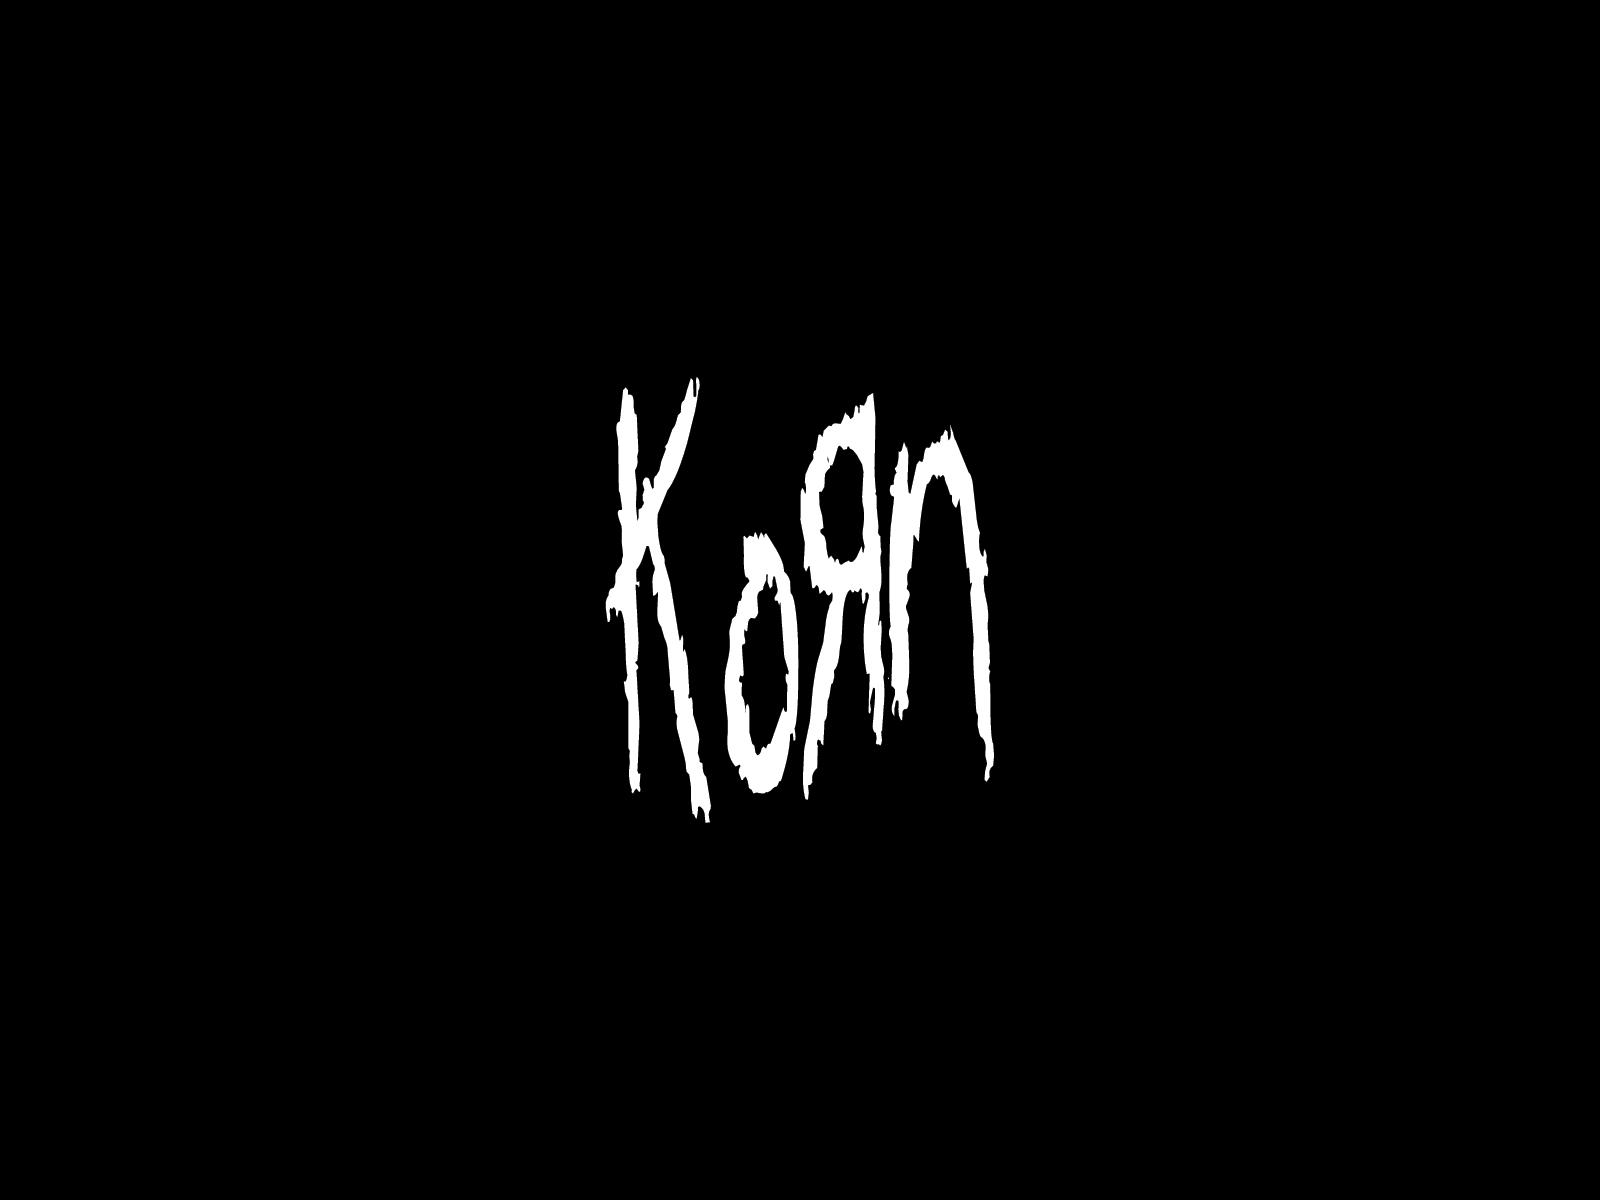 40 Korn Logo Wallpaper On Wallpapersafari